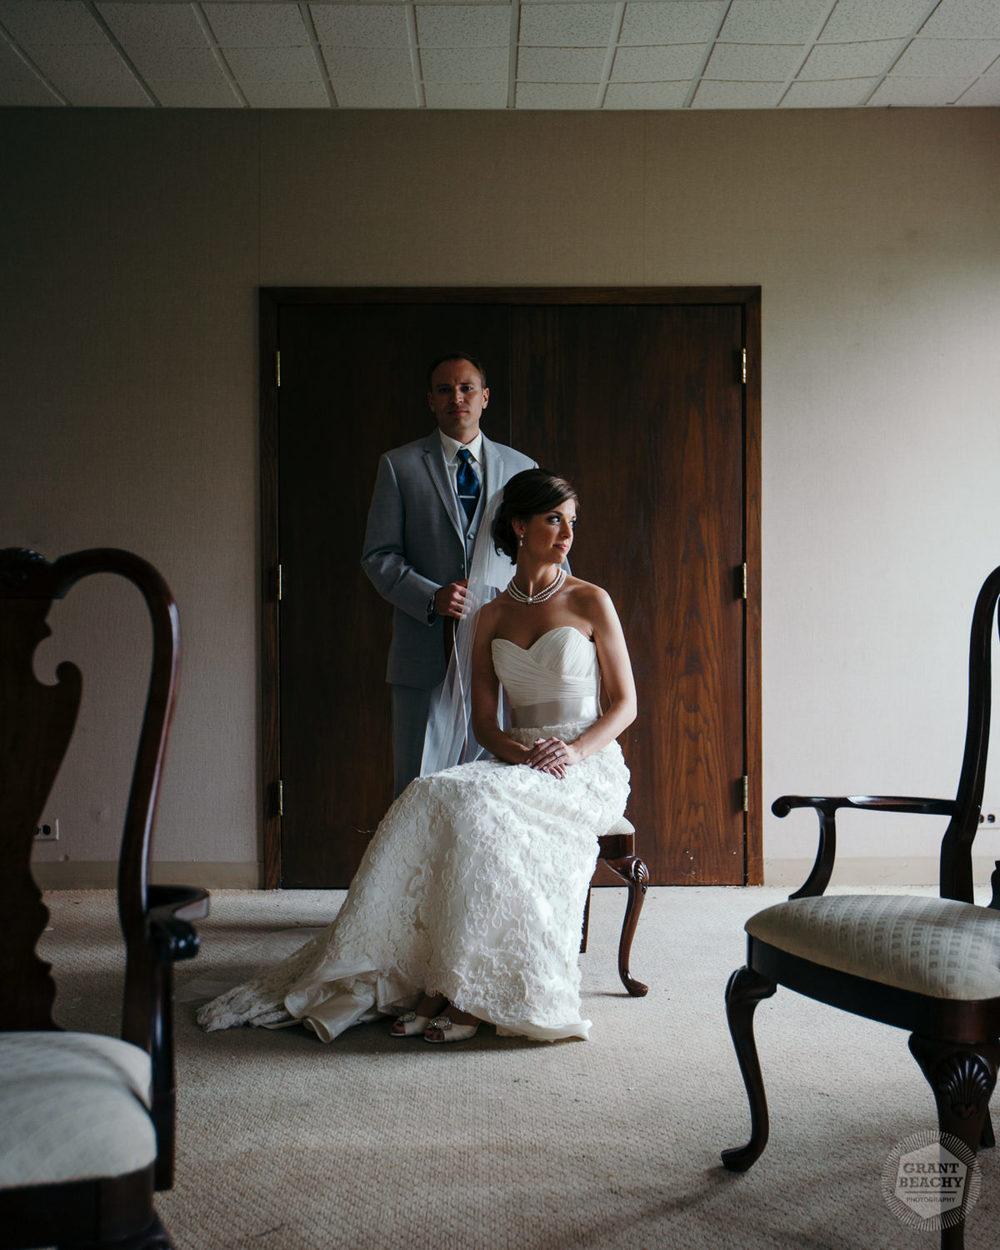 Grant Beachy-wedding photography-21.jpg